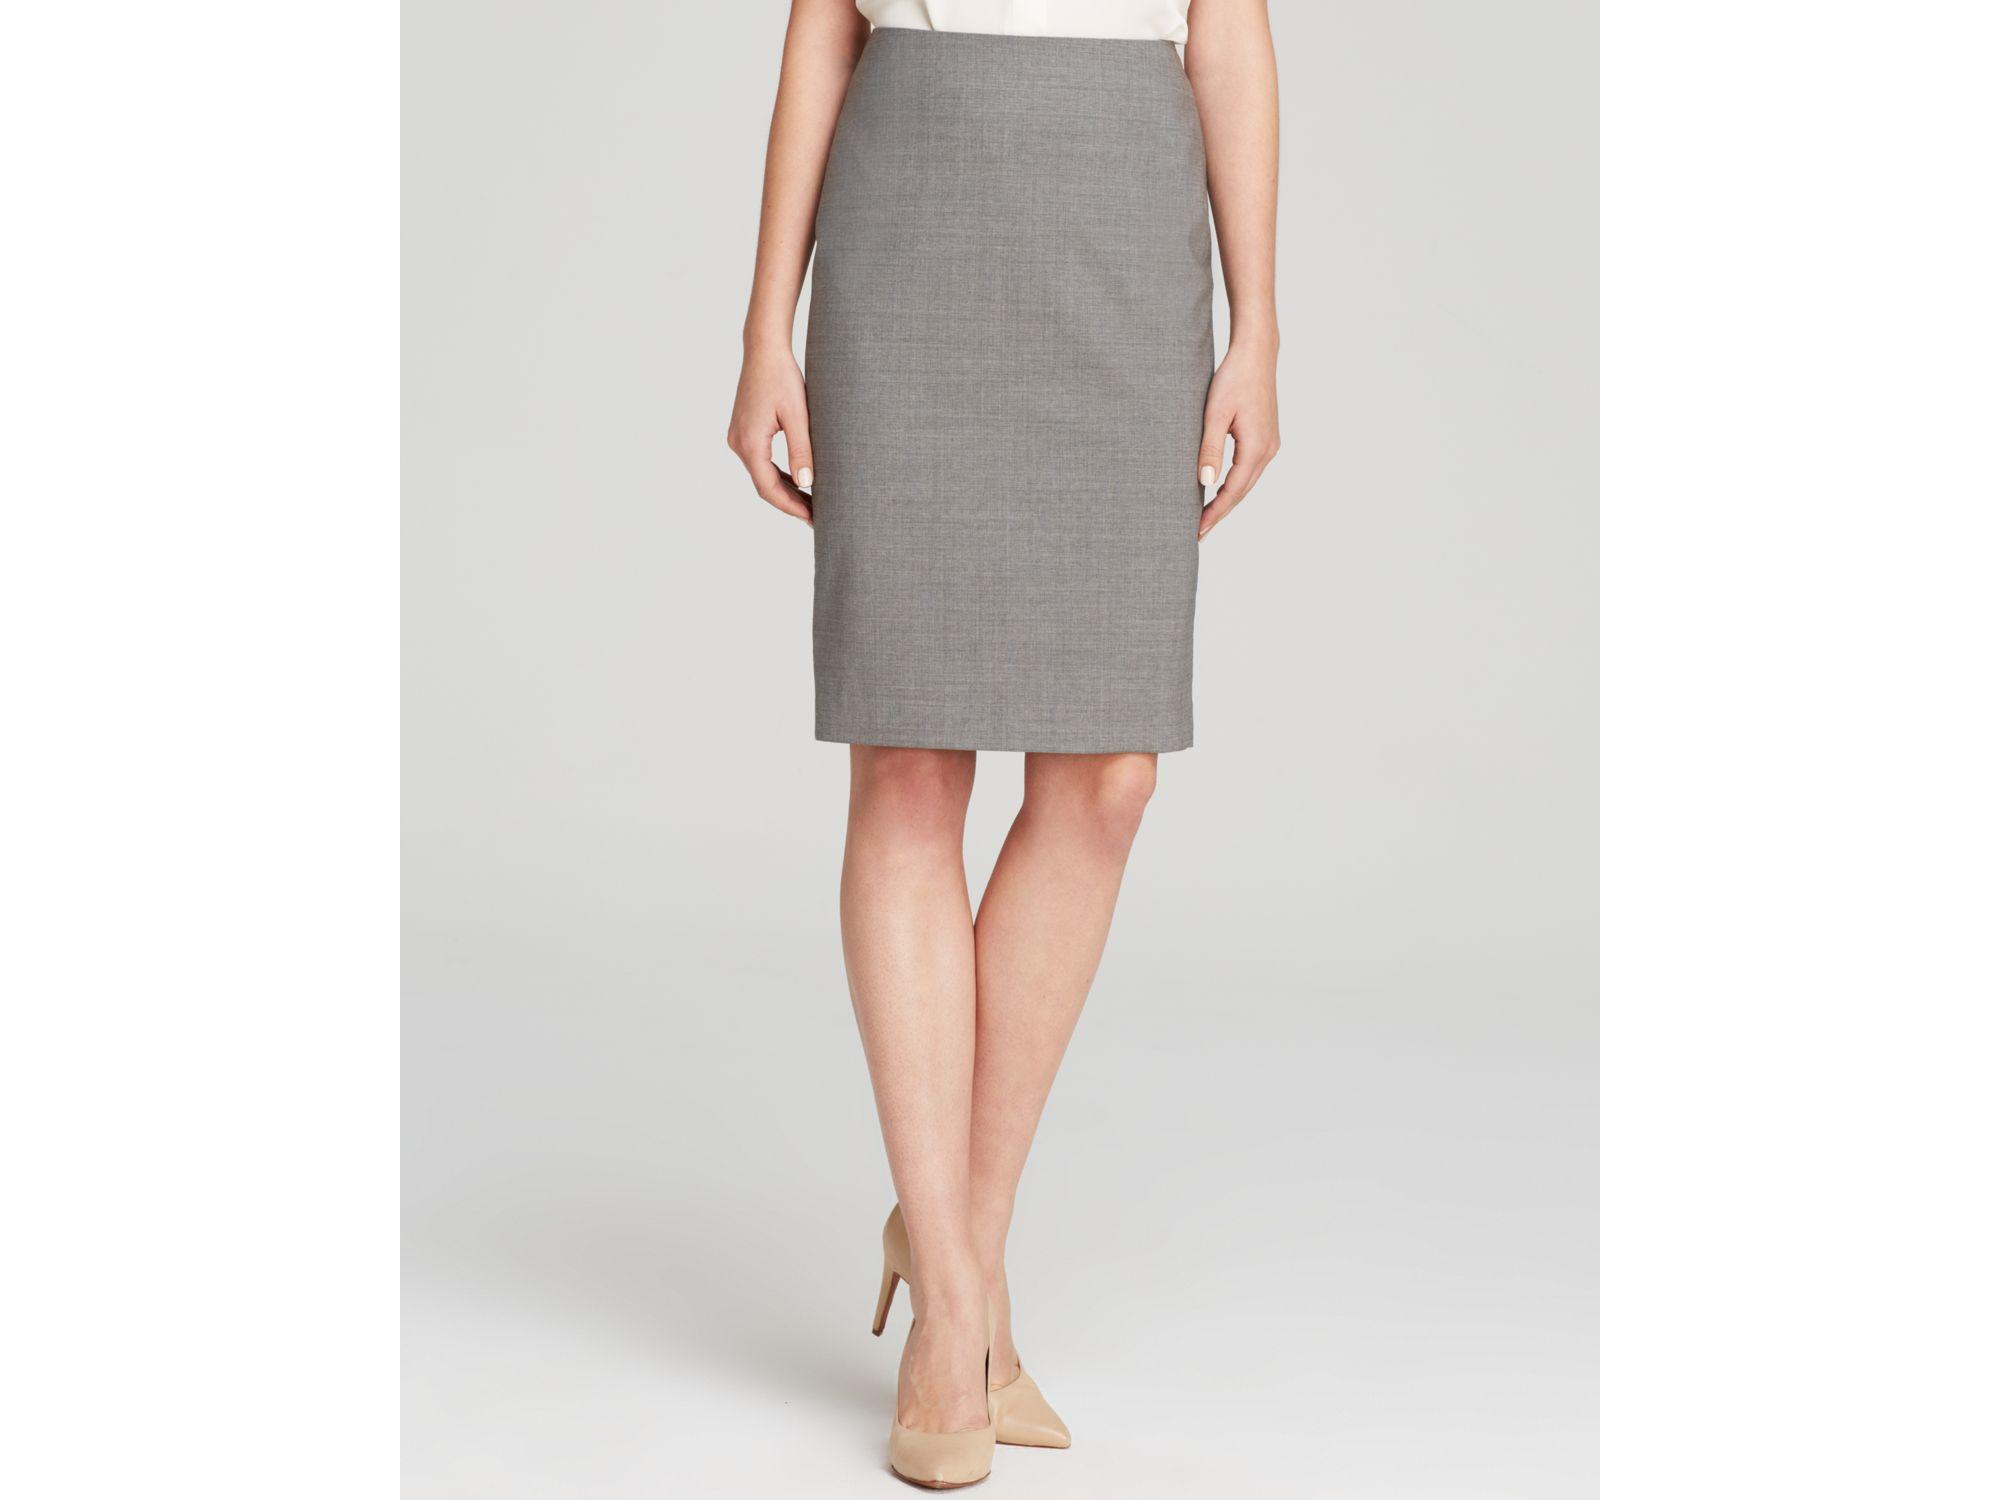 light gray pencil skirt dress ala